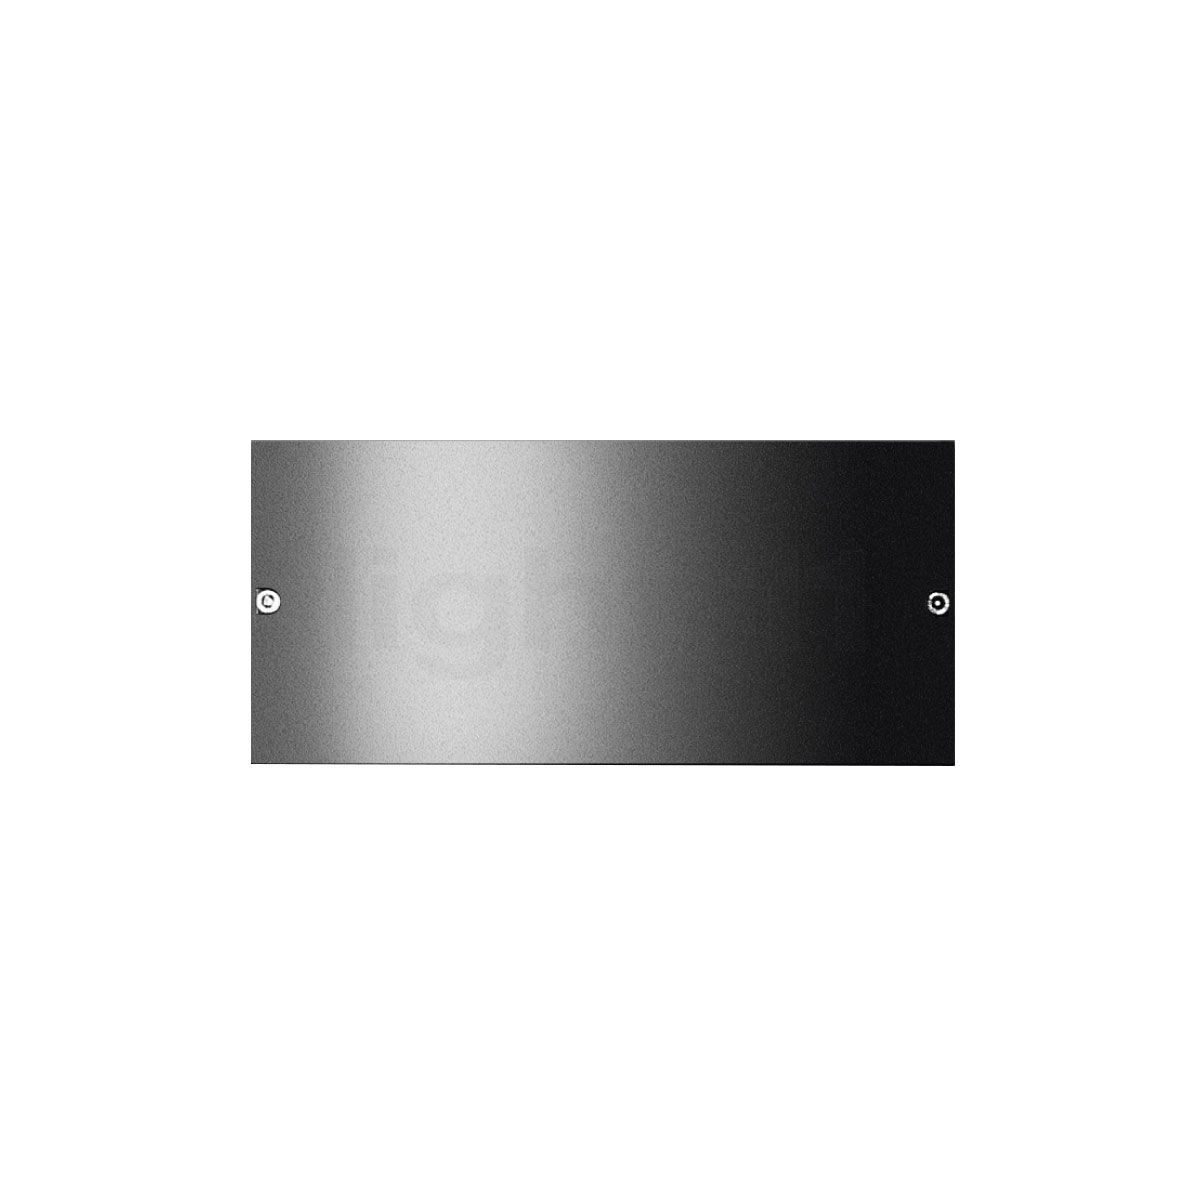 bega 33346 applique murale fluo en vente sur. Black Bedroom Furniture Sets. Home Design Ideas